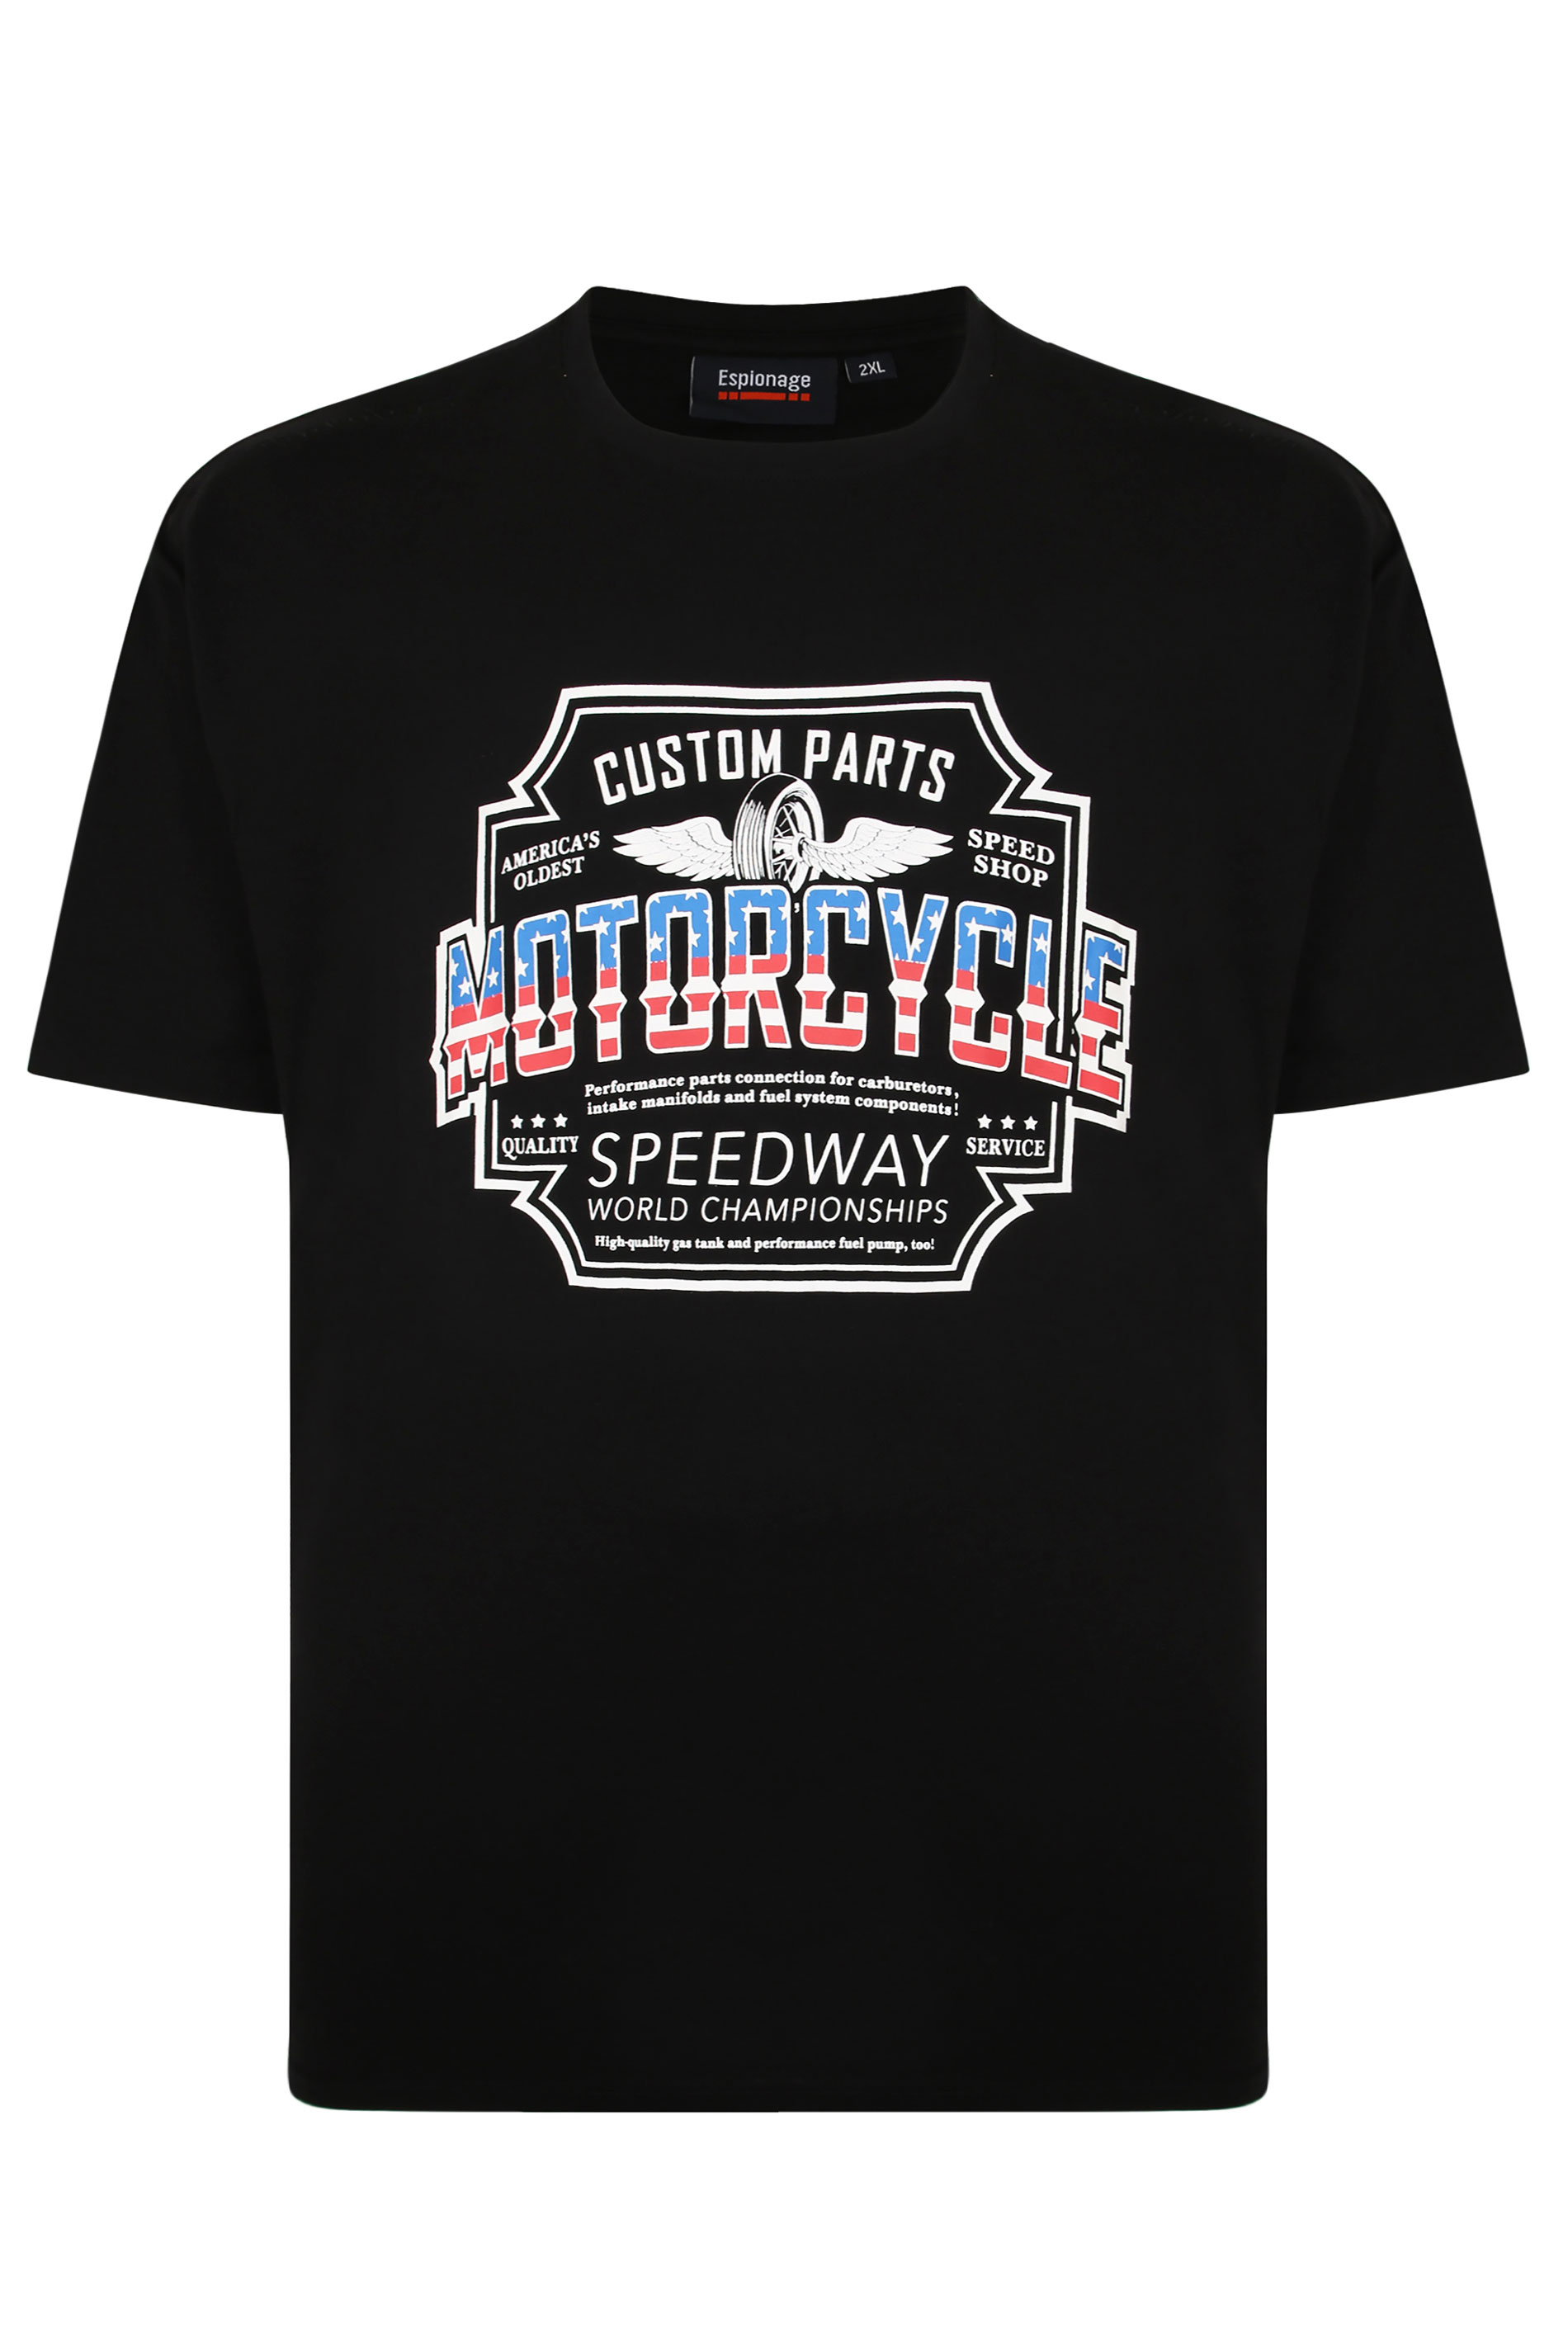 ESPIONAGE Black 'Motorcycle' Graphic T-Shirt_F.jpg